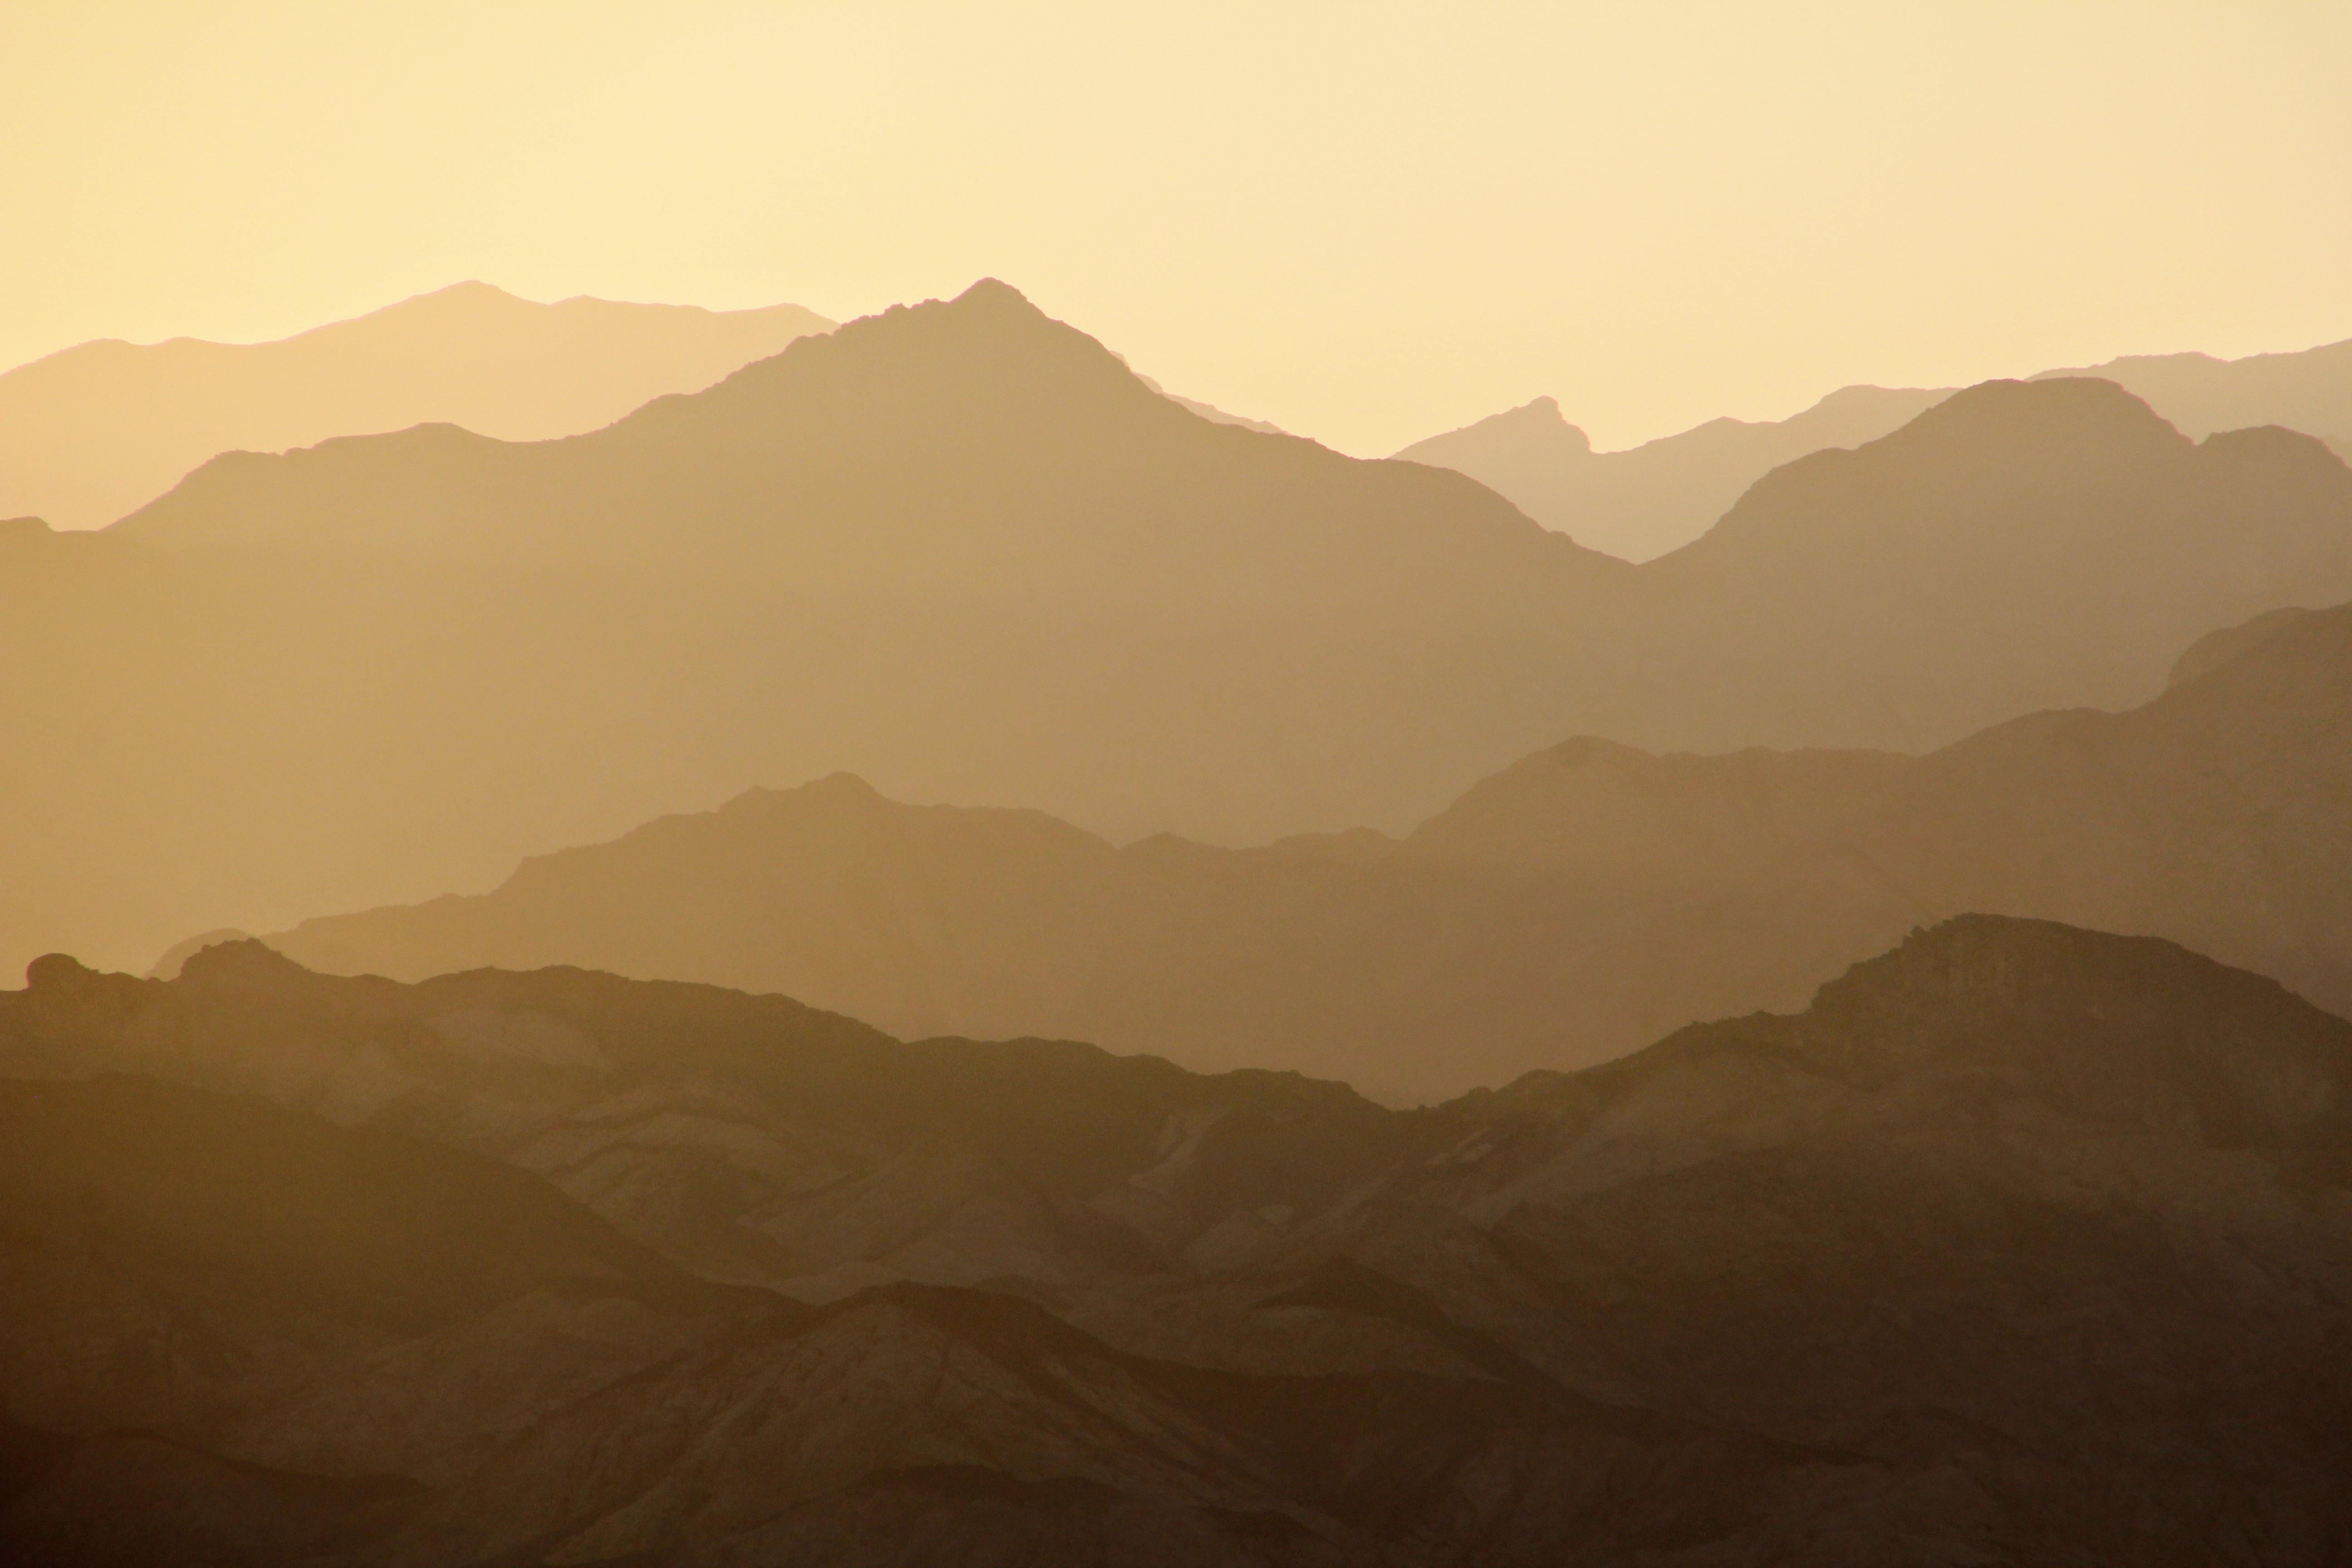 Best Wallpaper Mountain Morning - landscape-rock-horizon-mountain-sunrise-sunset-mist-sunlight-morning-hill-wave-dawn-valley-mountain-range-dusk-shadow-haze-plain-summit-illuminated-background-mountains-plateau-wallpaper-layer-evening-sun-wadi-hilly-mountainous-landform-highest-peak-geographical-feature-atmospheric-phenomenon-mountainous-landforms-1171199  Collection_654662.jpg